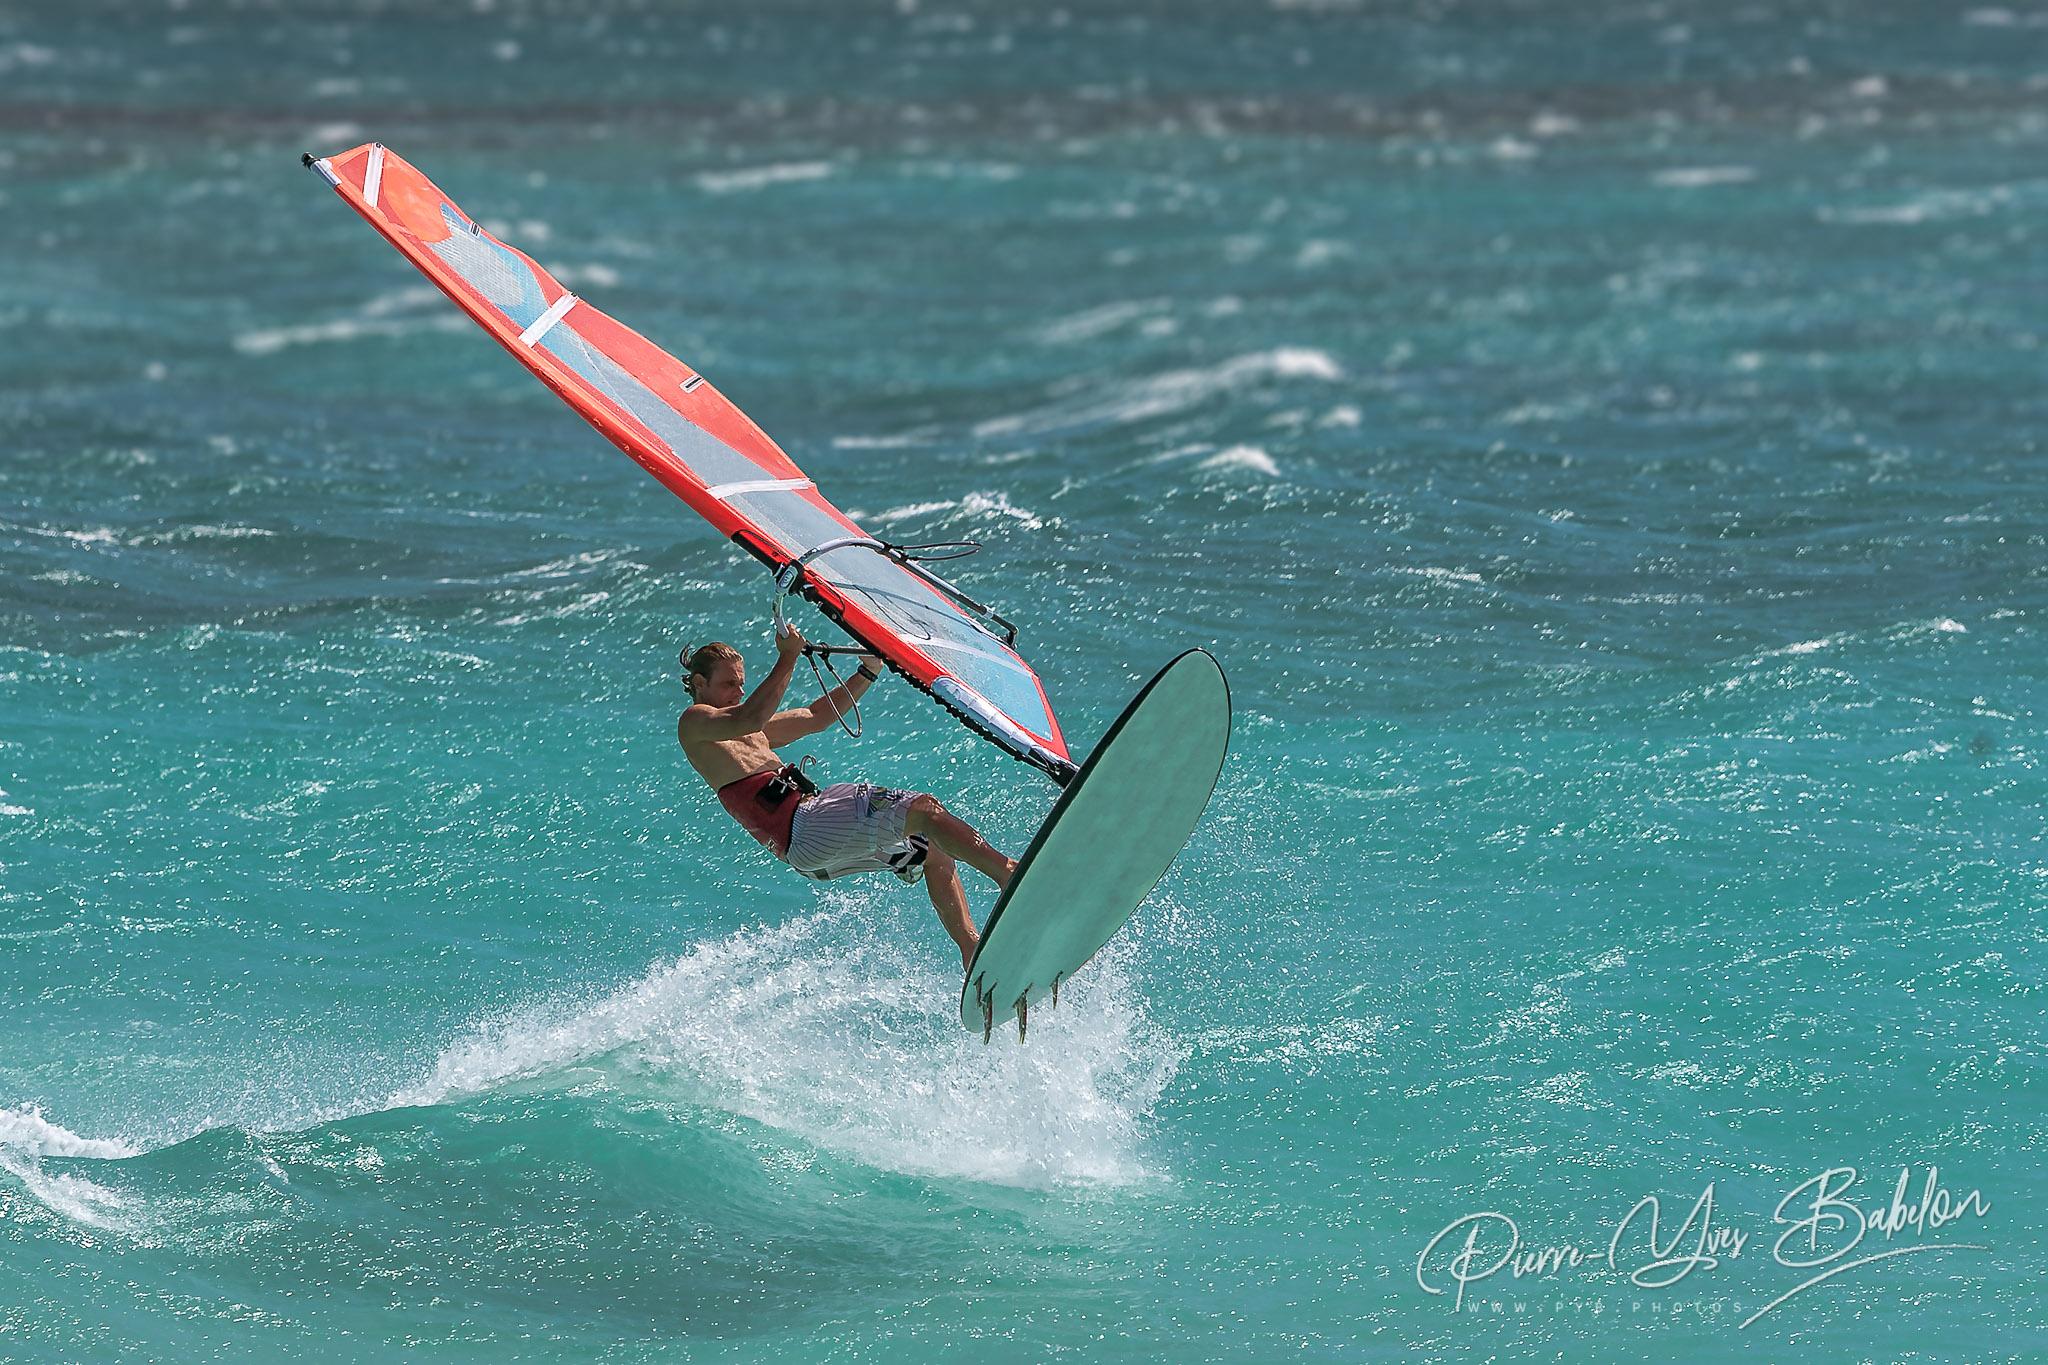 Professional windsurfer